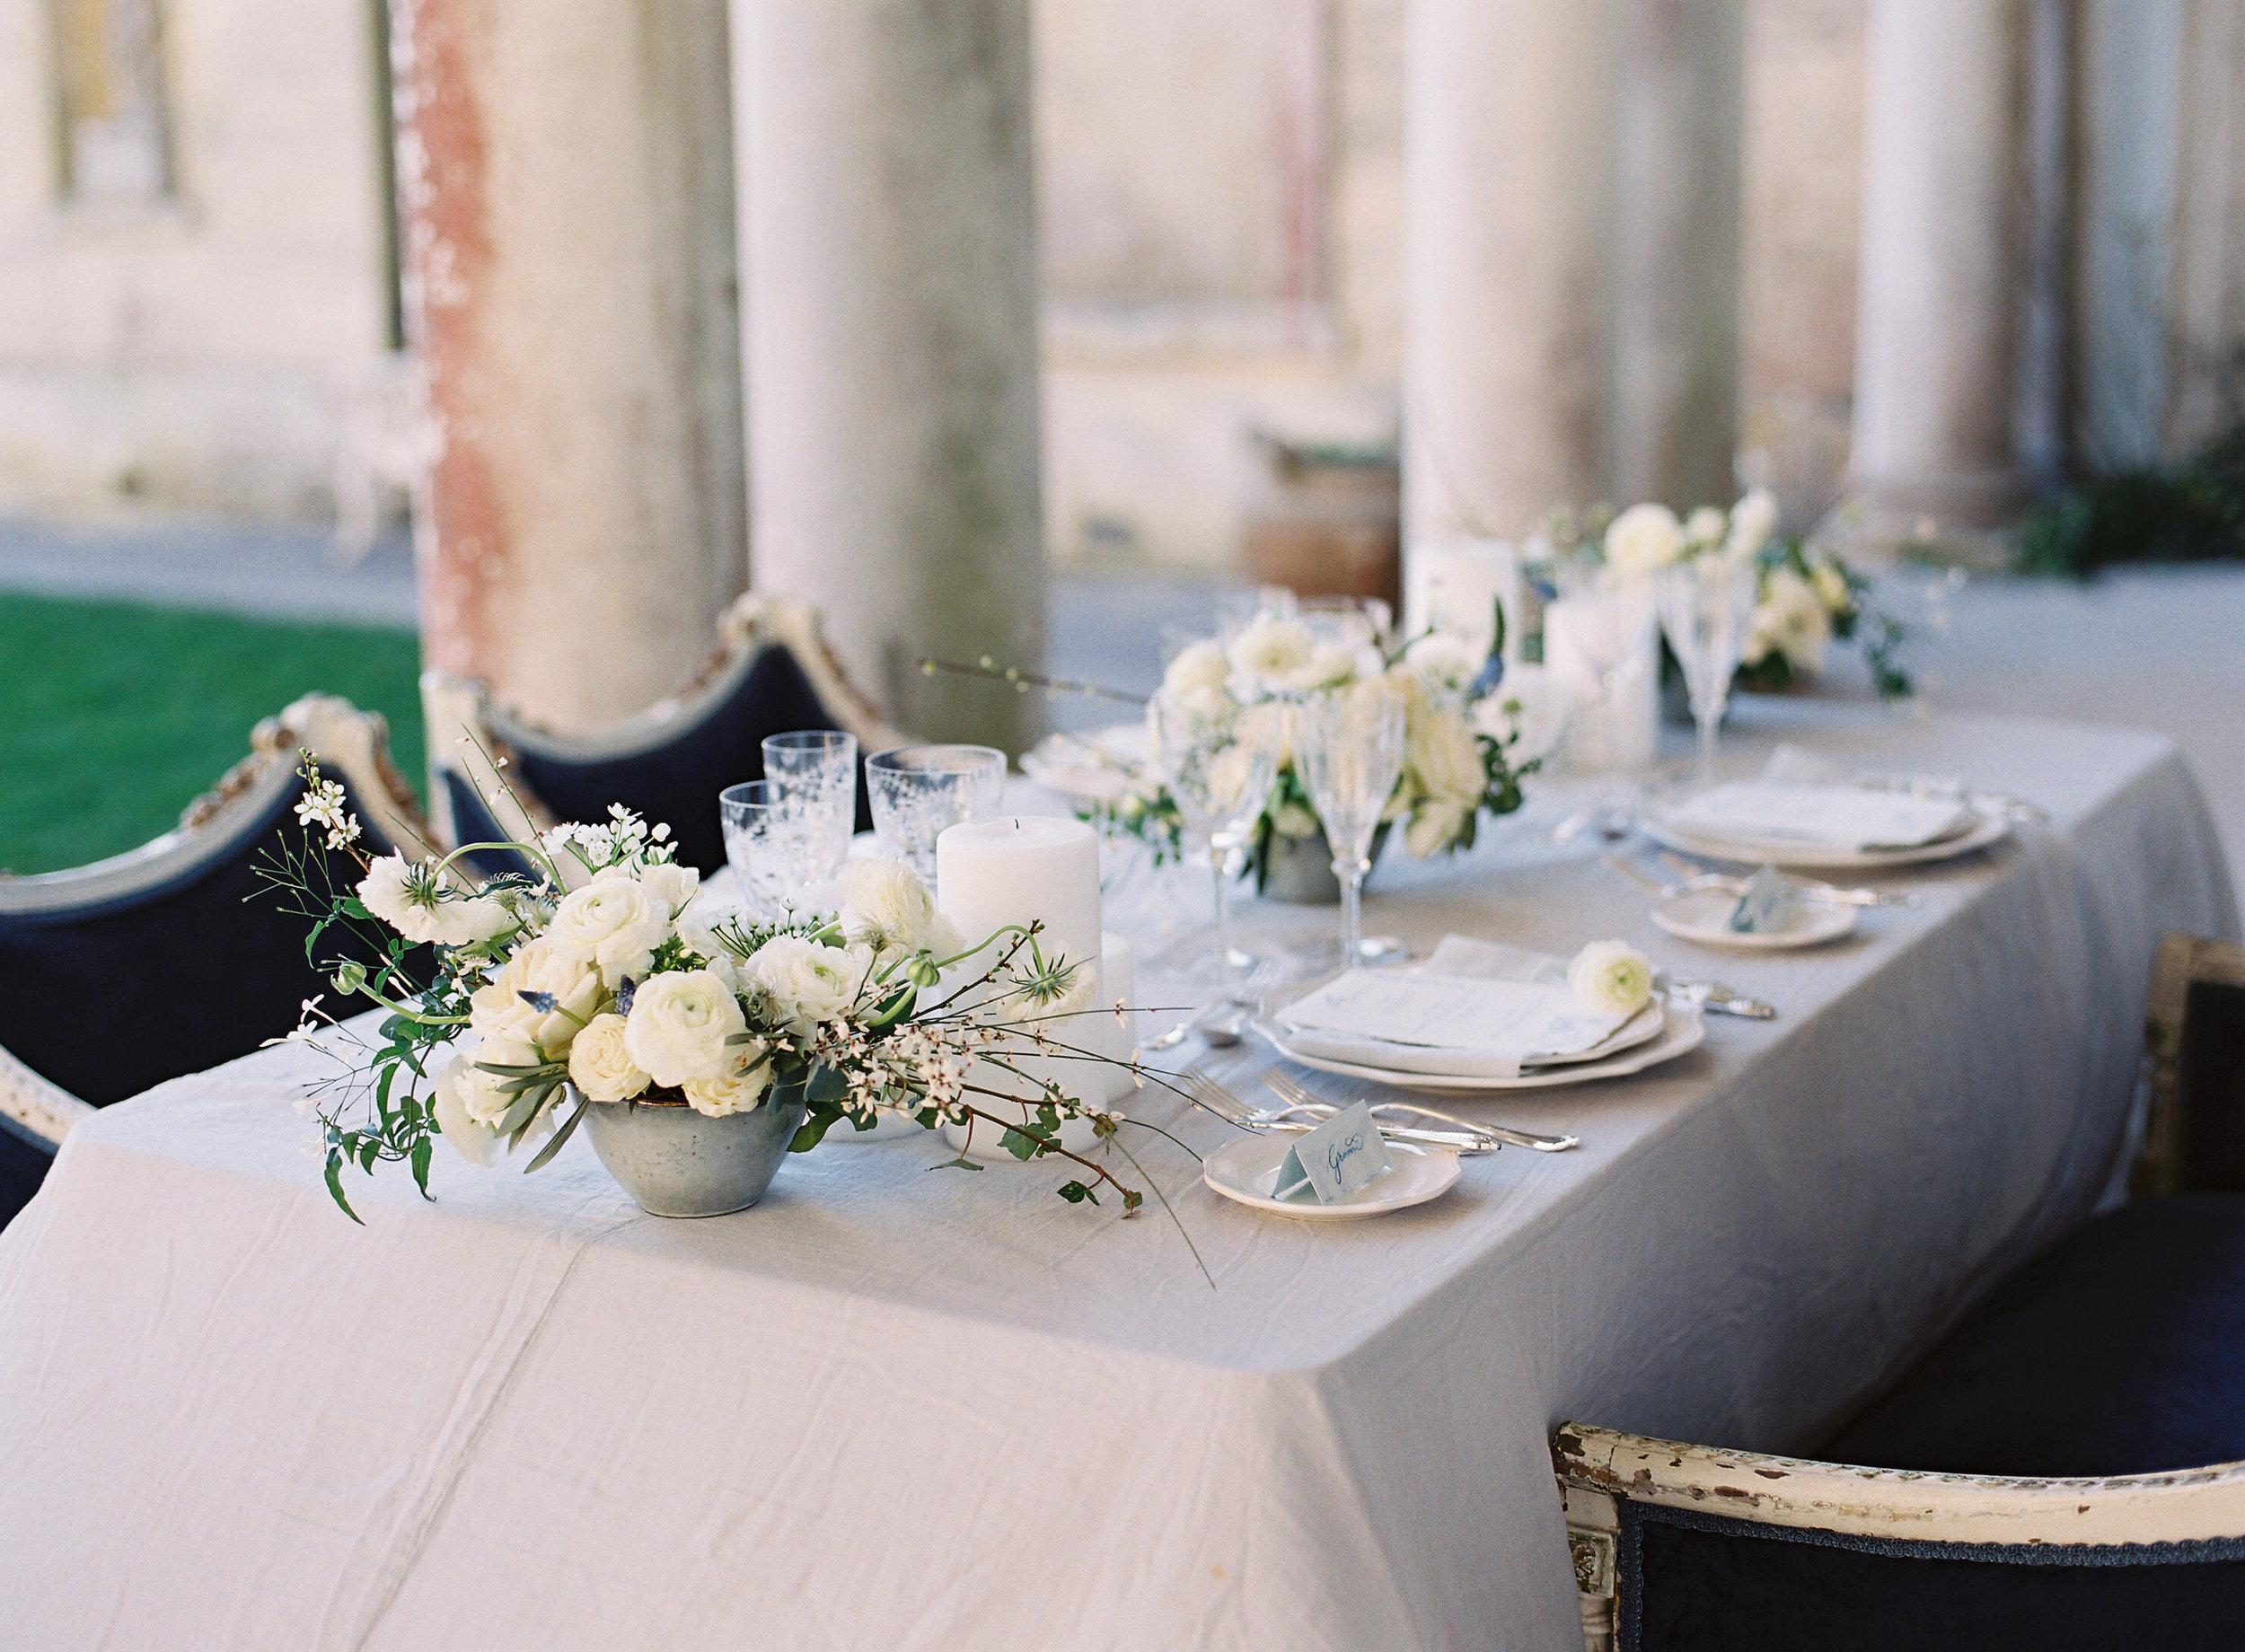 The Timeless Stylist-A Forgotten Love Story-Fine Art Wedding Editorial-Heirloom Wedding Styling 47.jpg